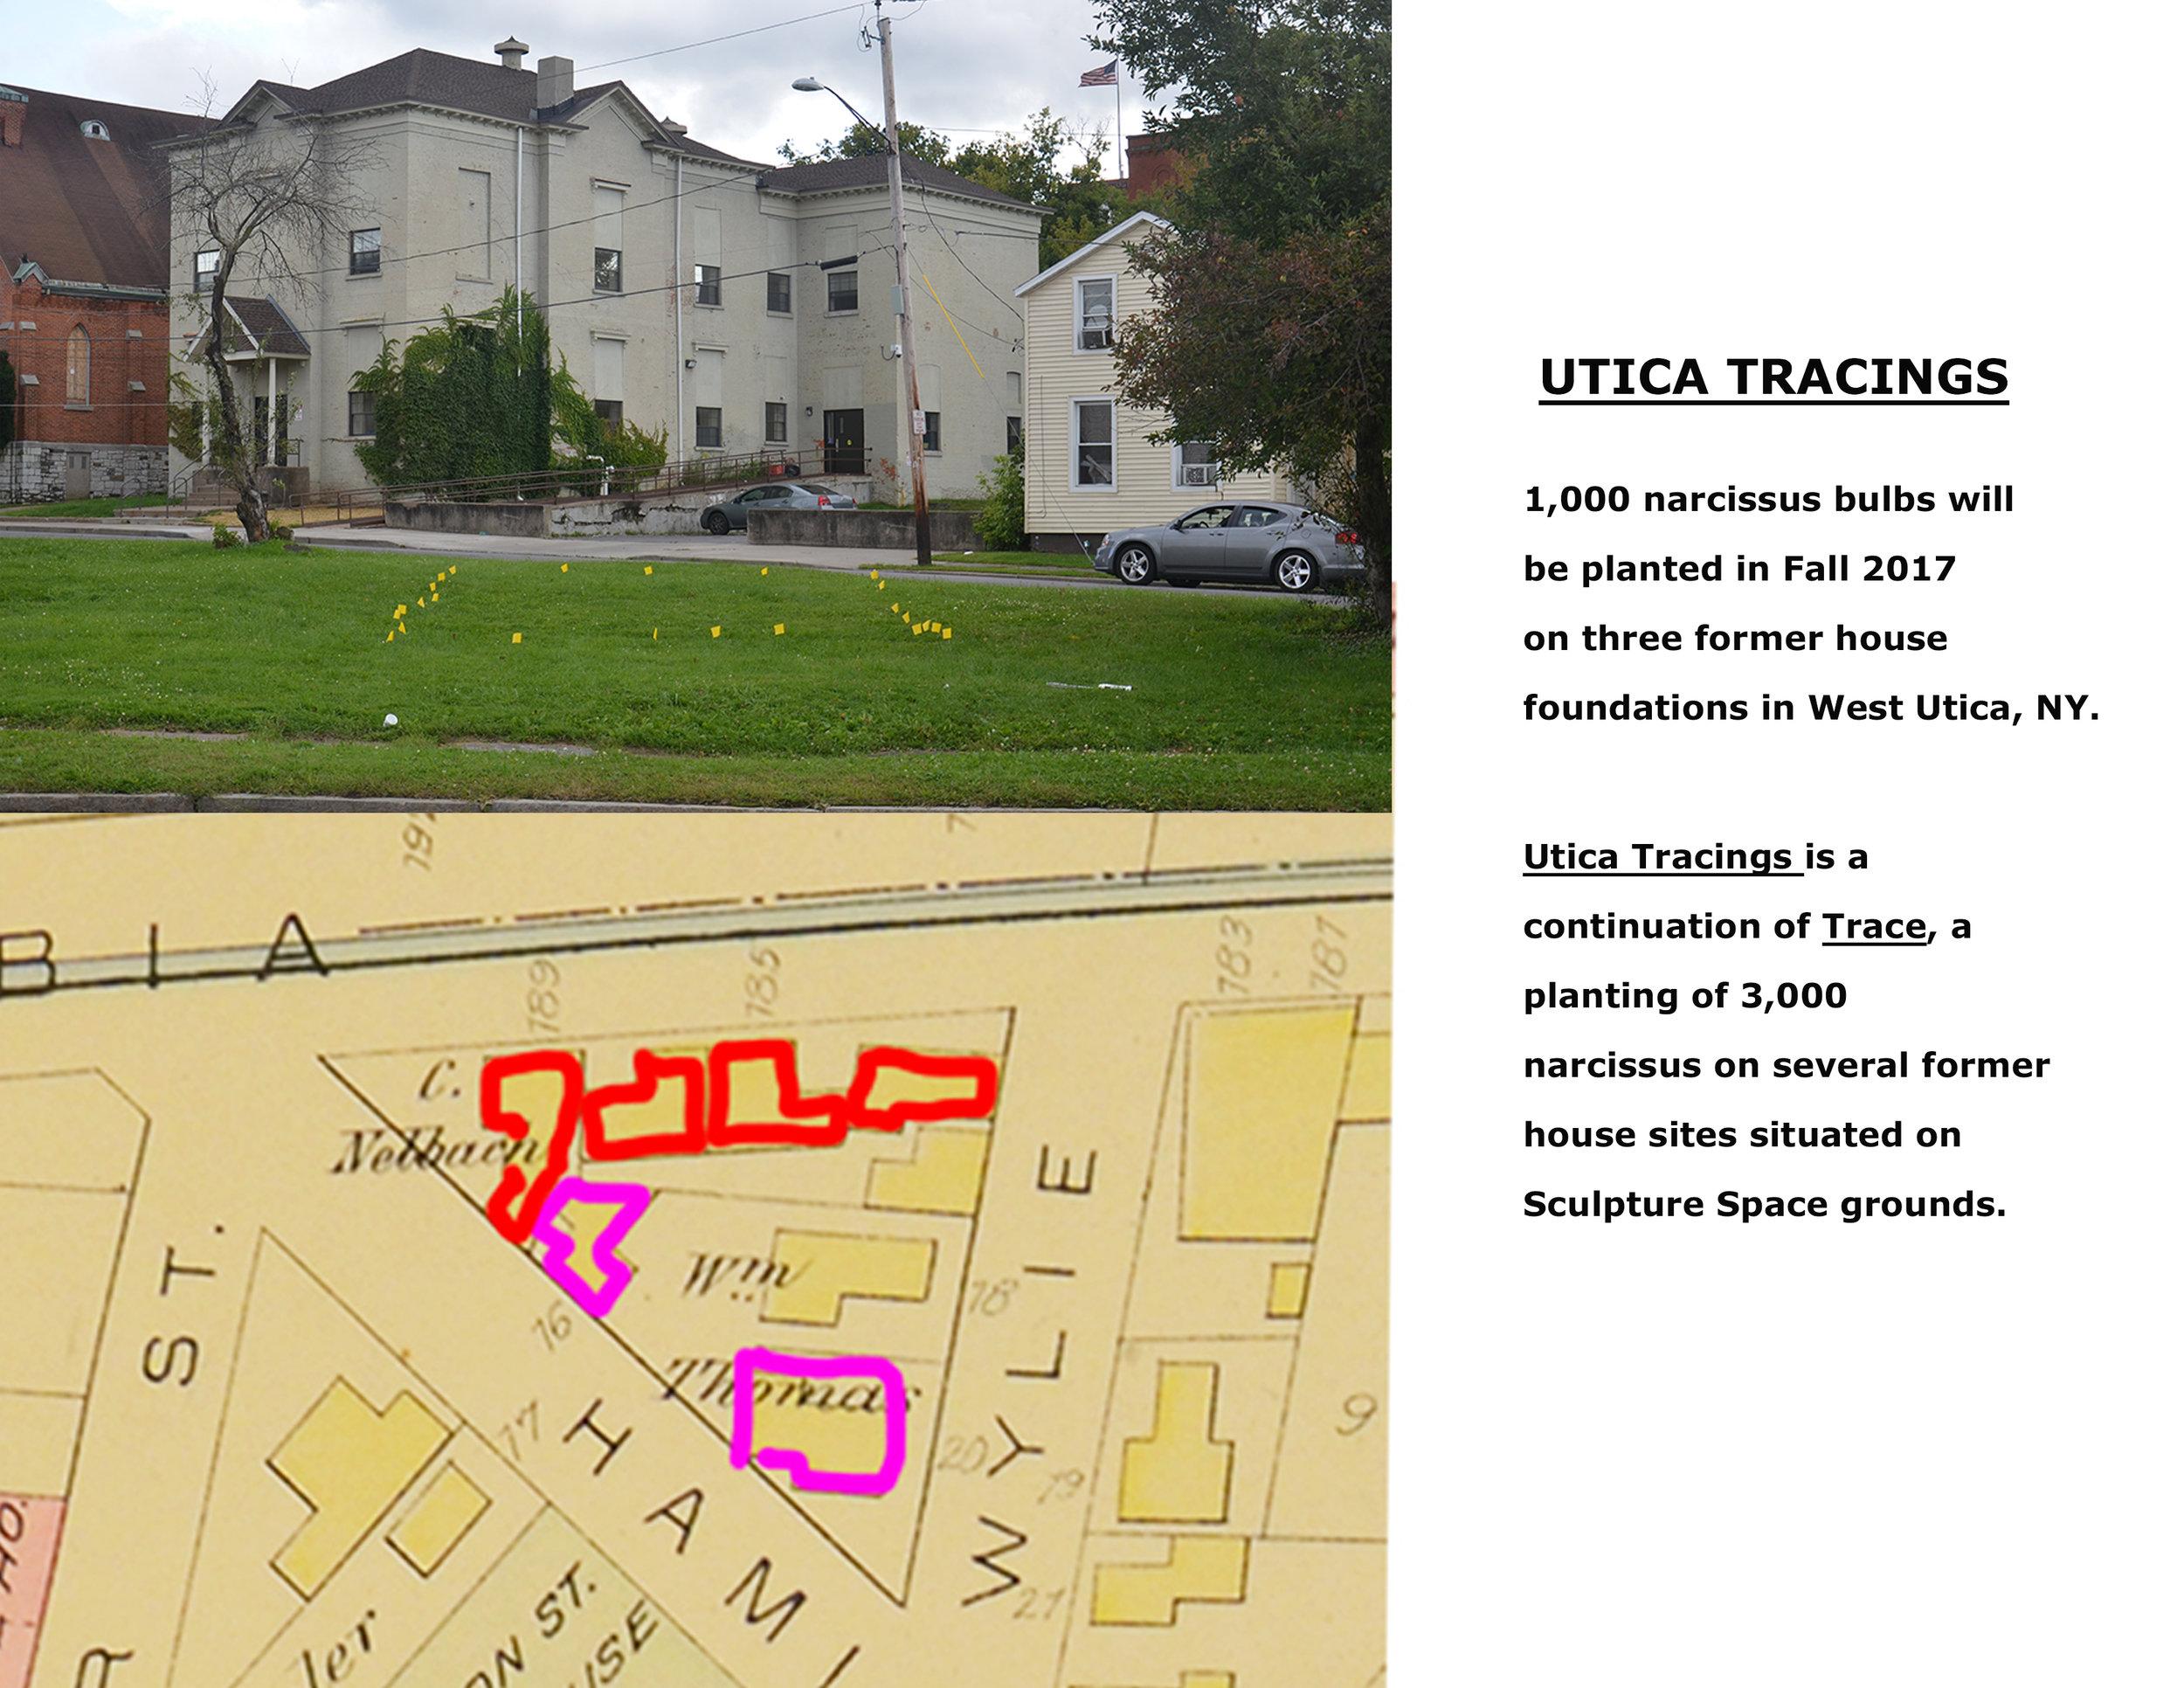 Utica Tracings announcement web v2 copy.jpg